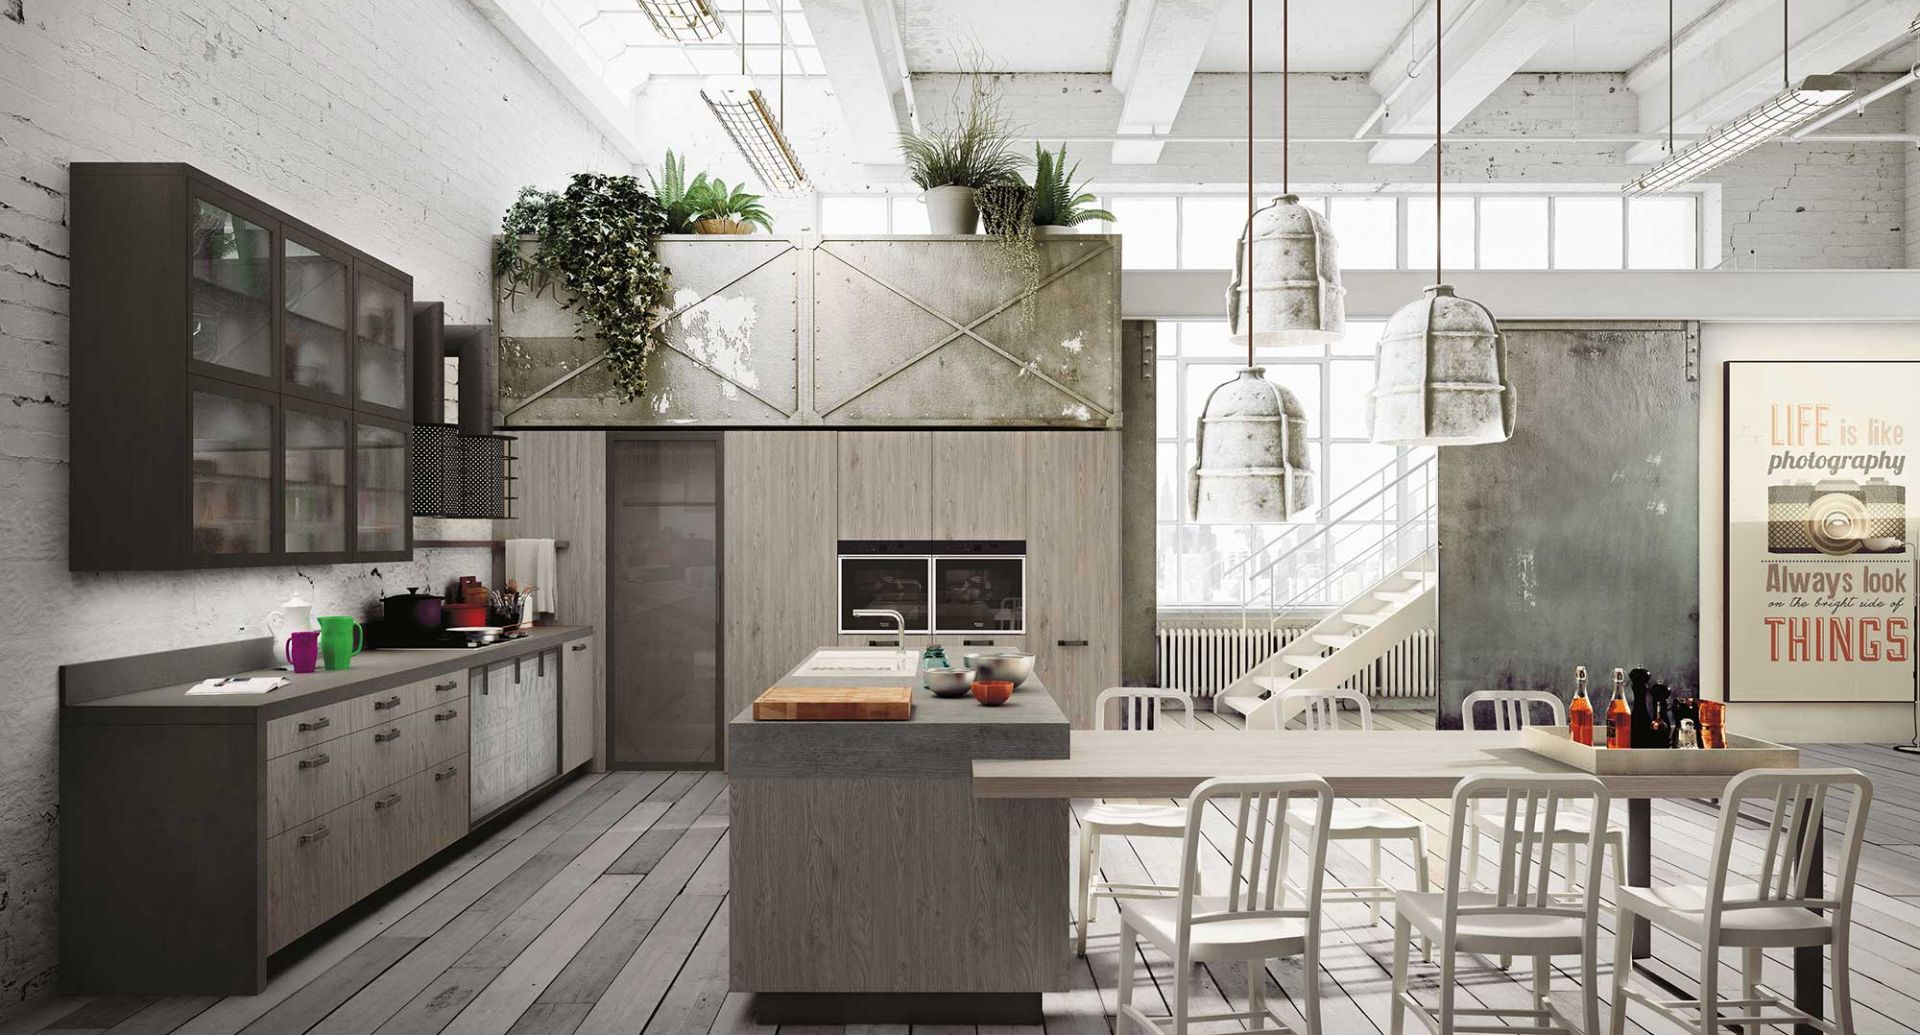 Wooden design kitchens Snaidero - Loft - photo 4